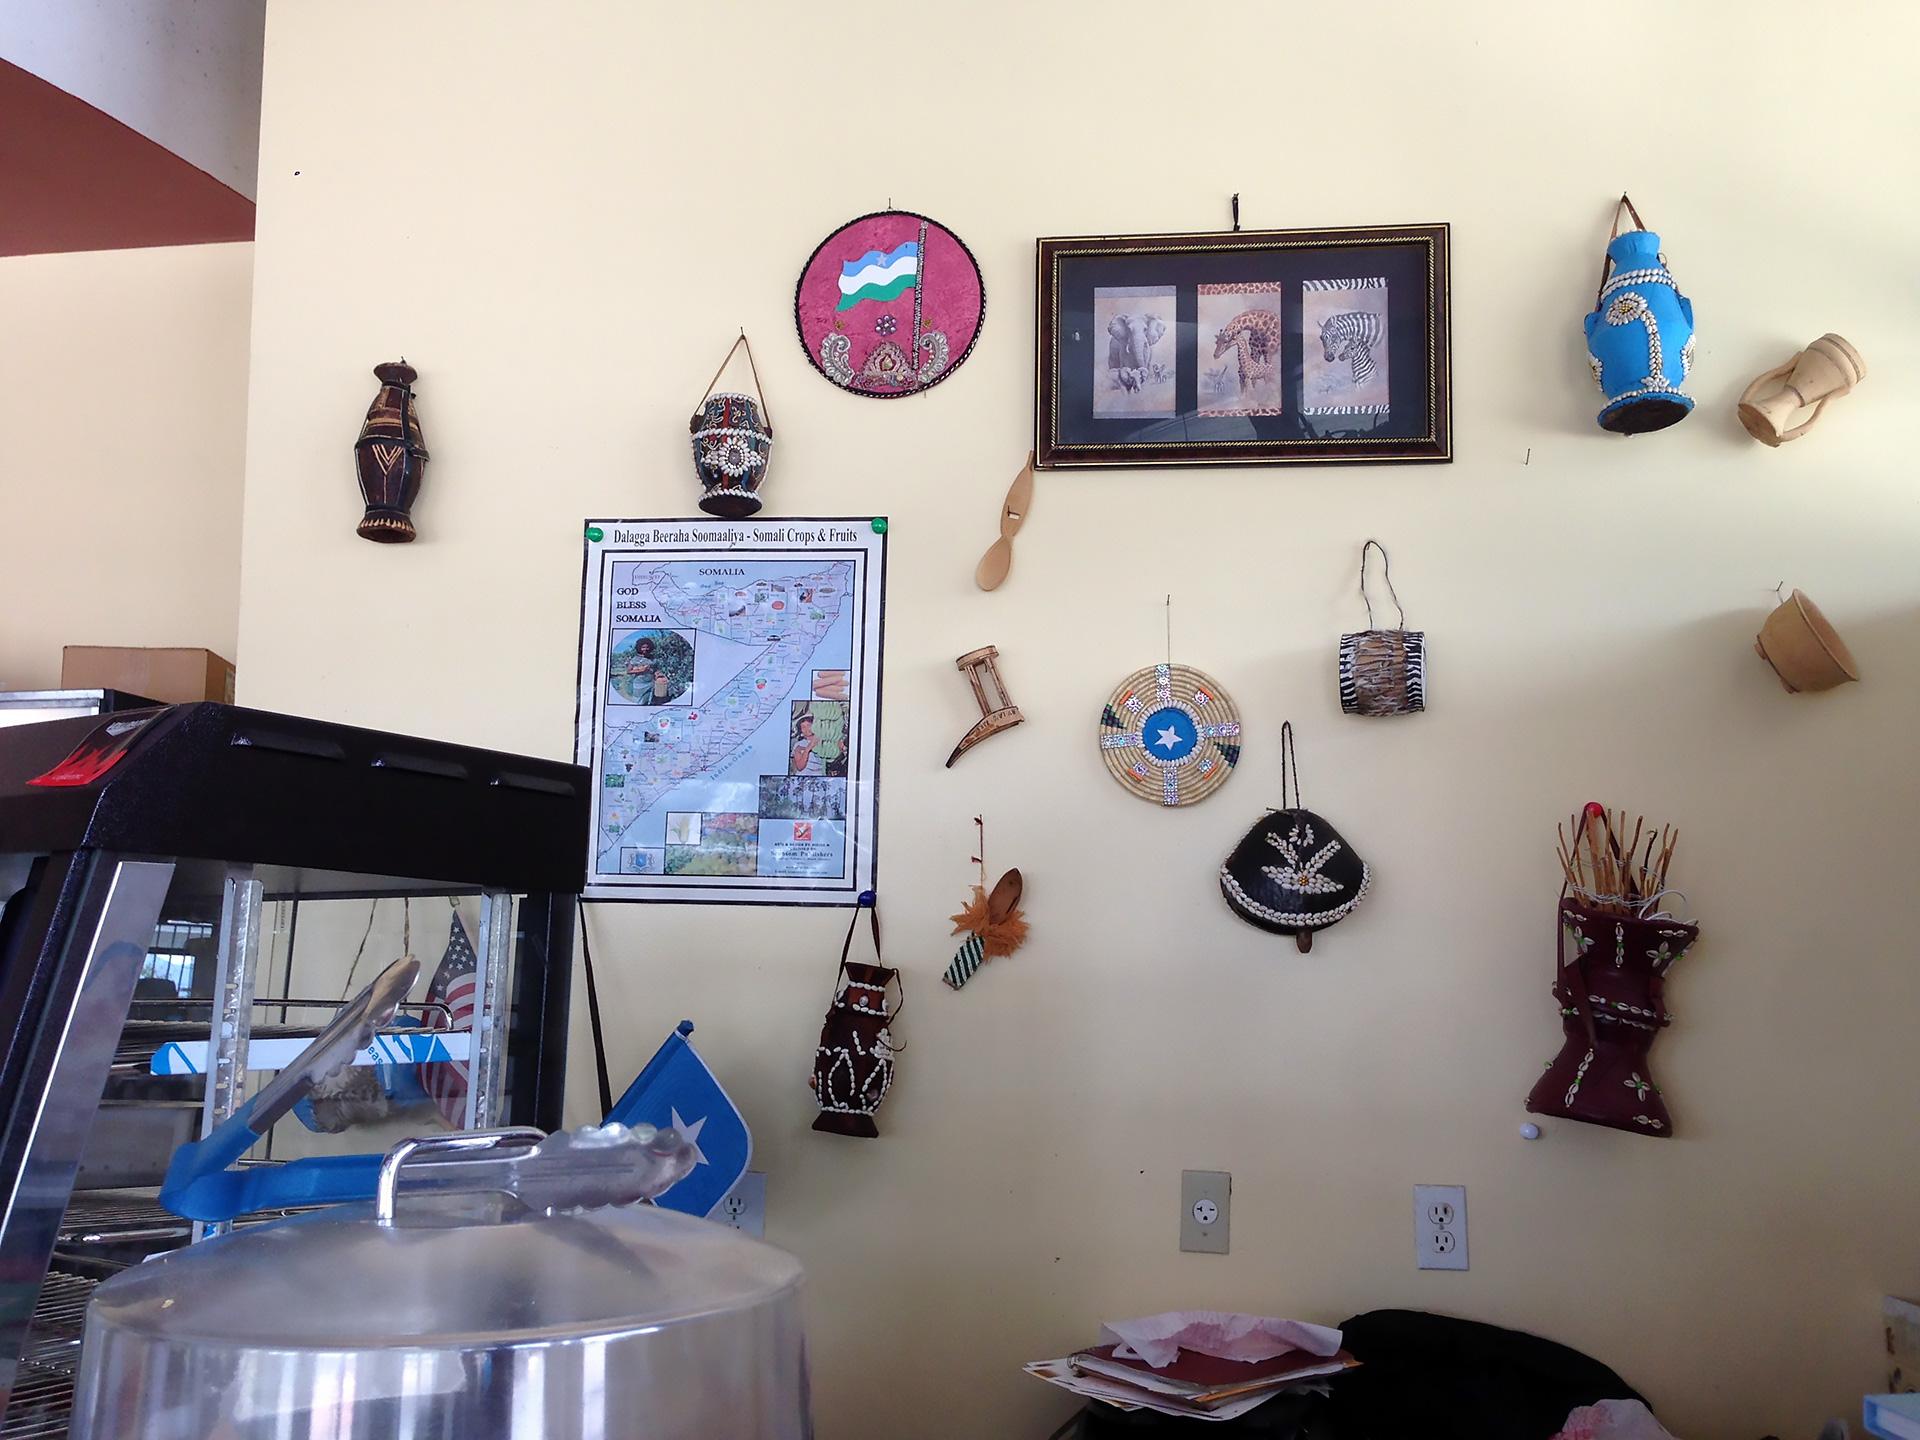 Somalian art decorations at Jubba.